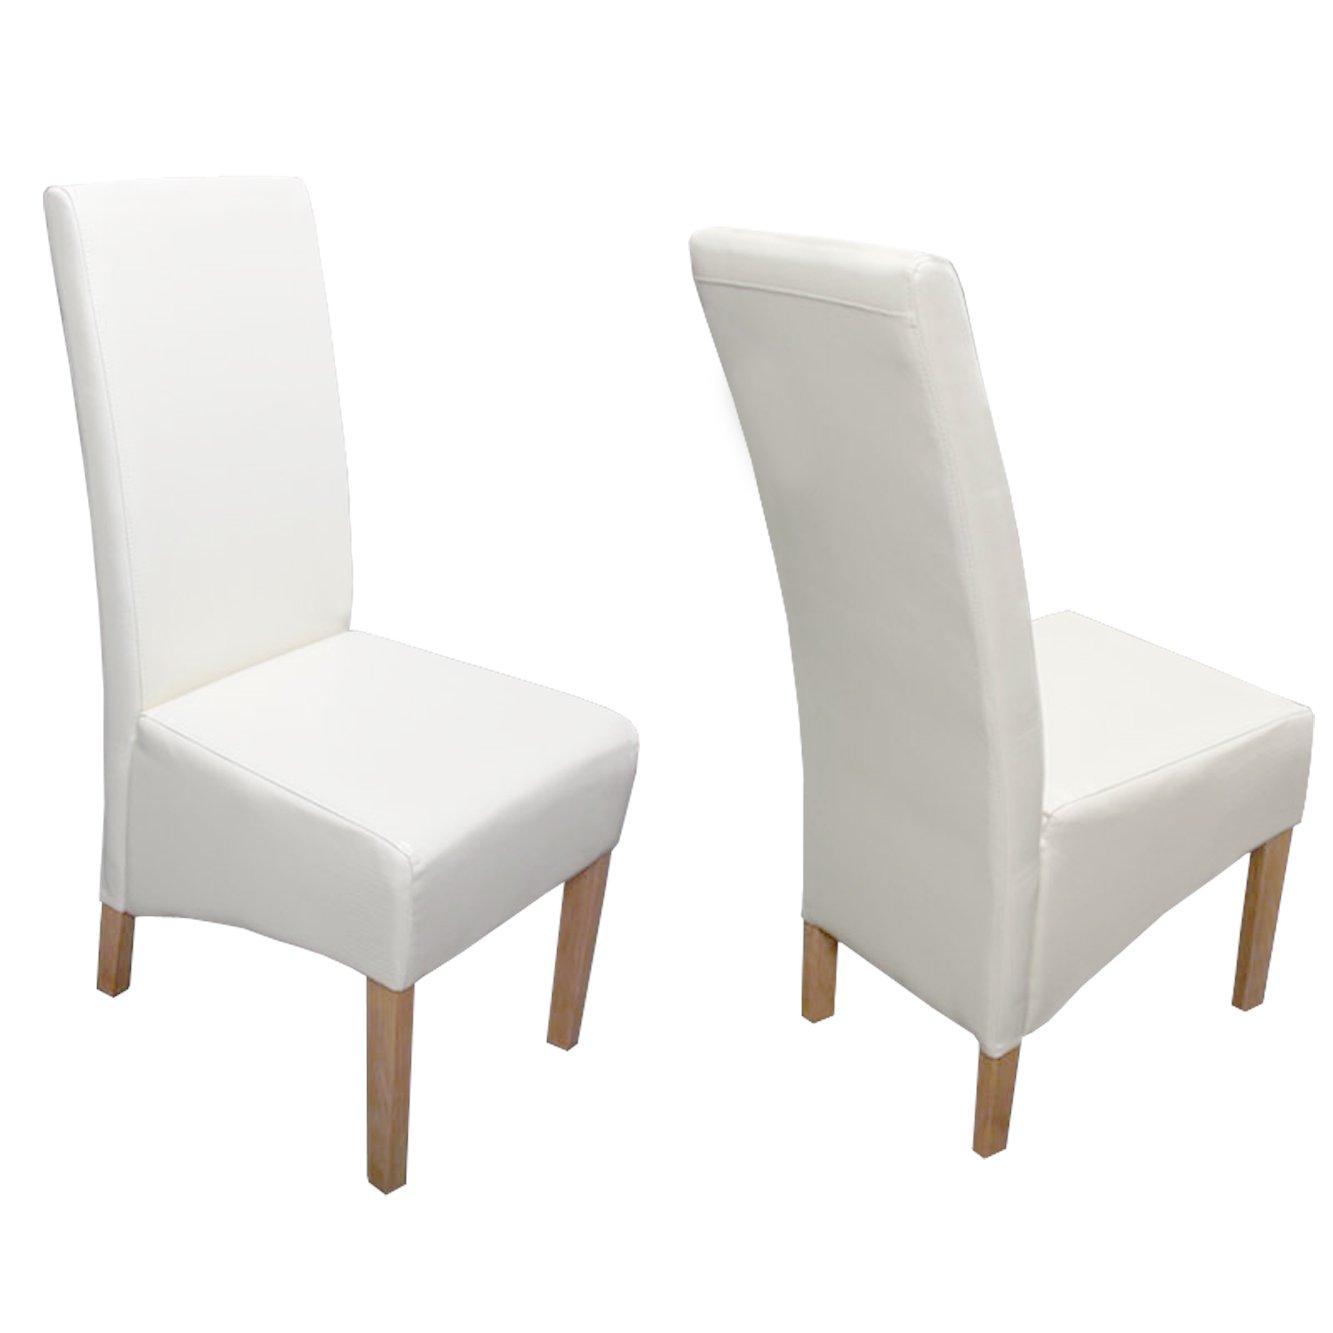 Lote 6 sillas de comedor siena ii en piel beige lote 6 for Sillas de comedor de piel